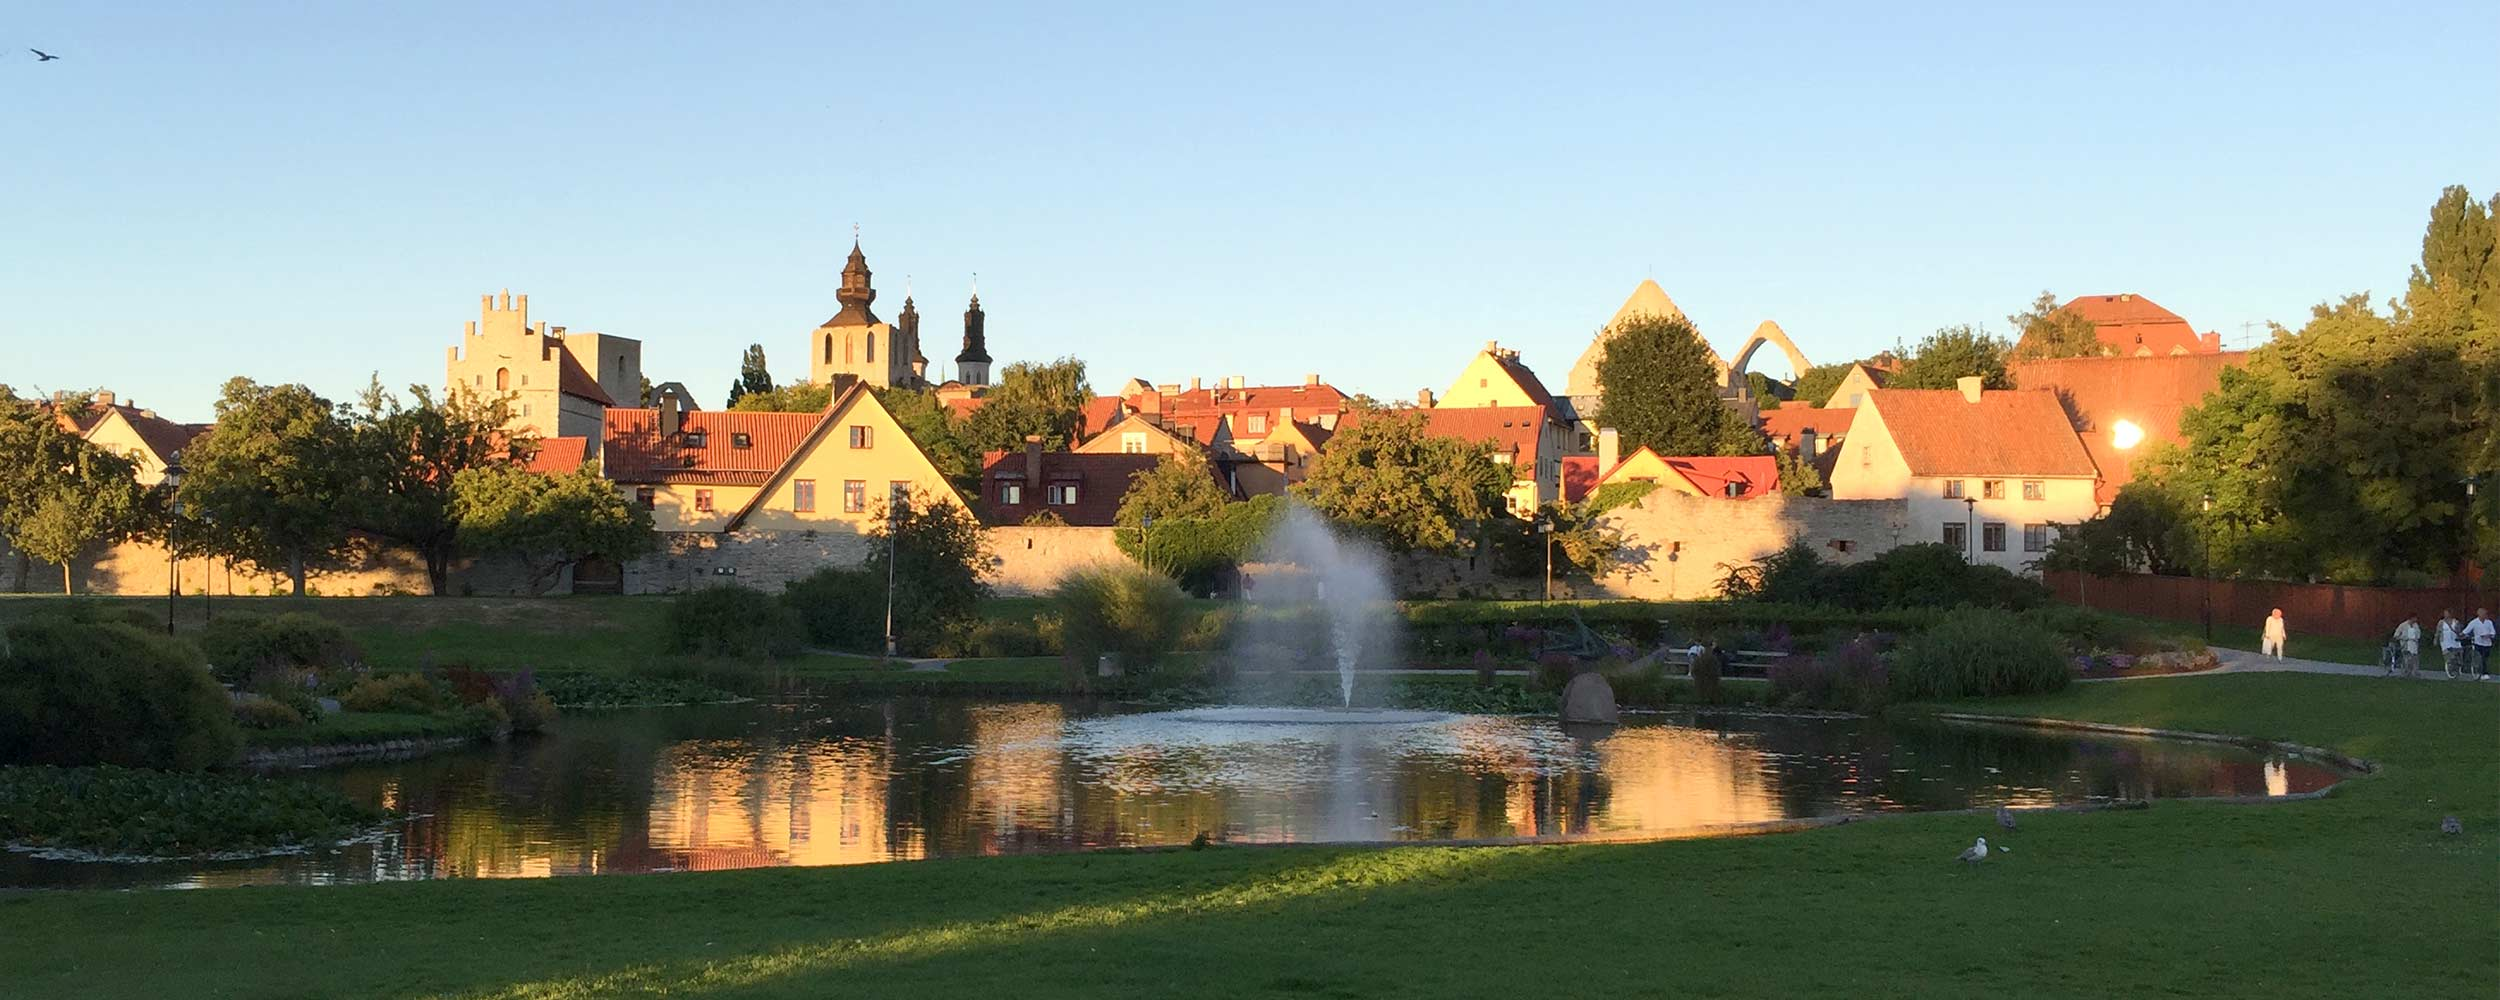 Gotlands Besöksnäring AB